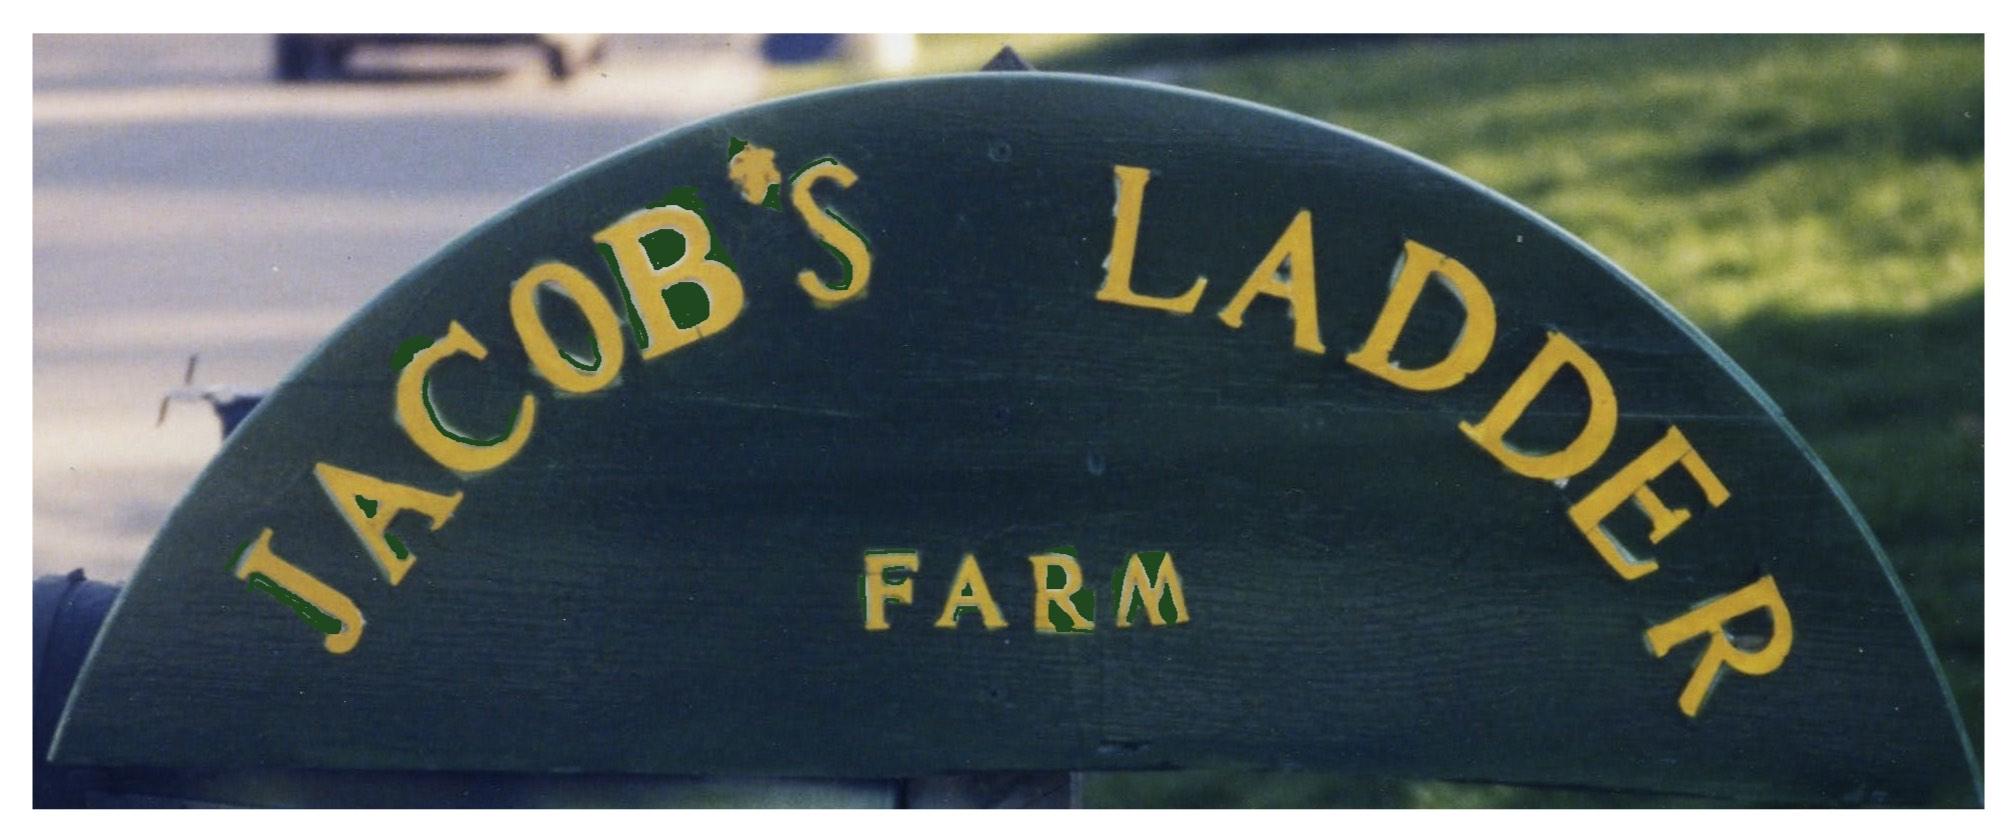 Jacob's Ladder Farm